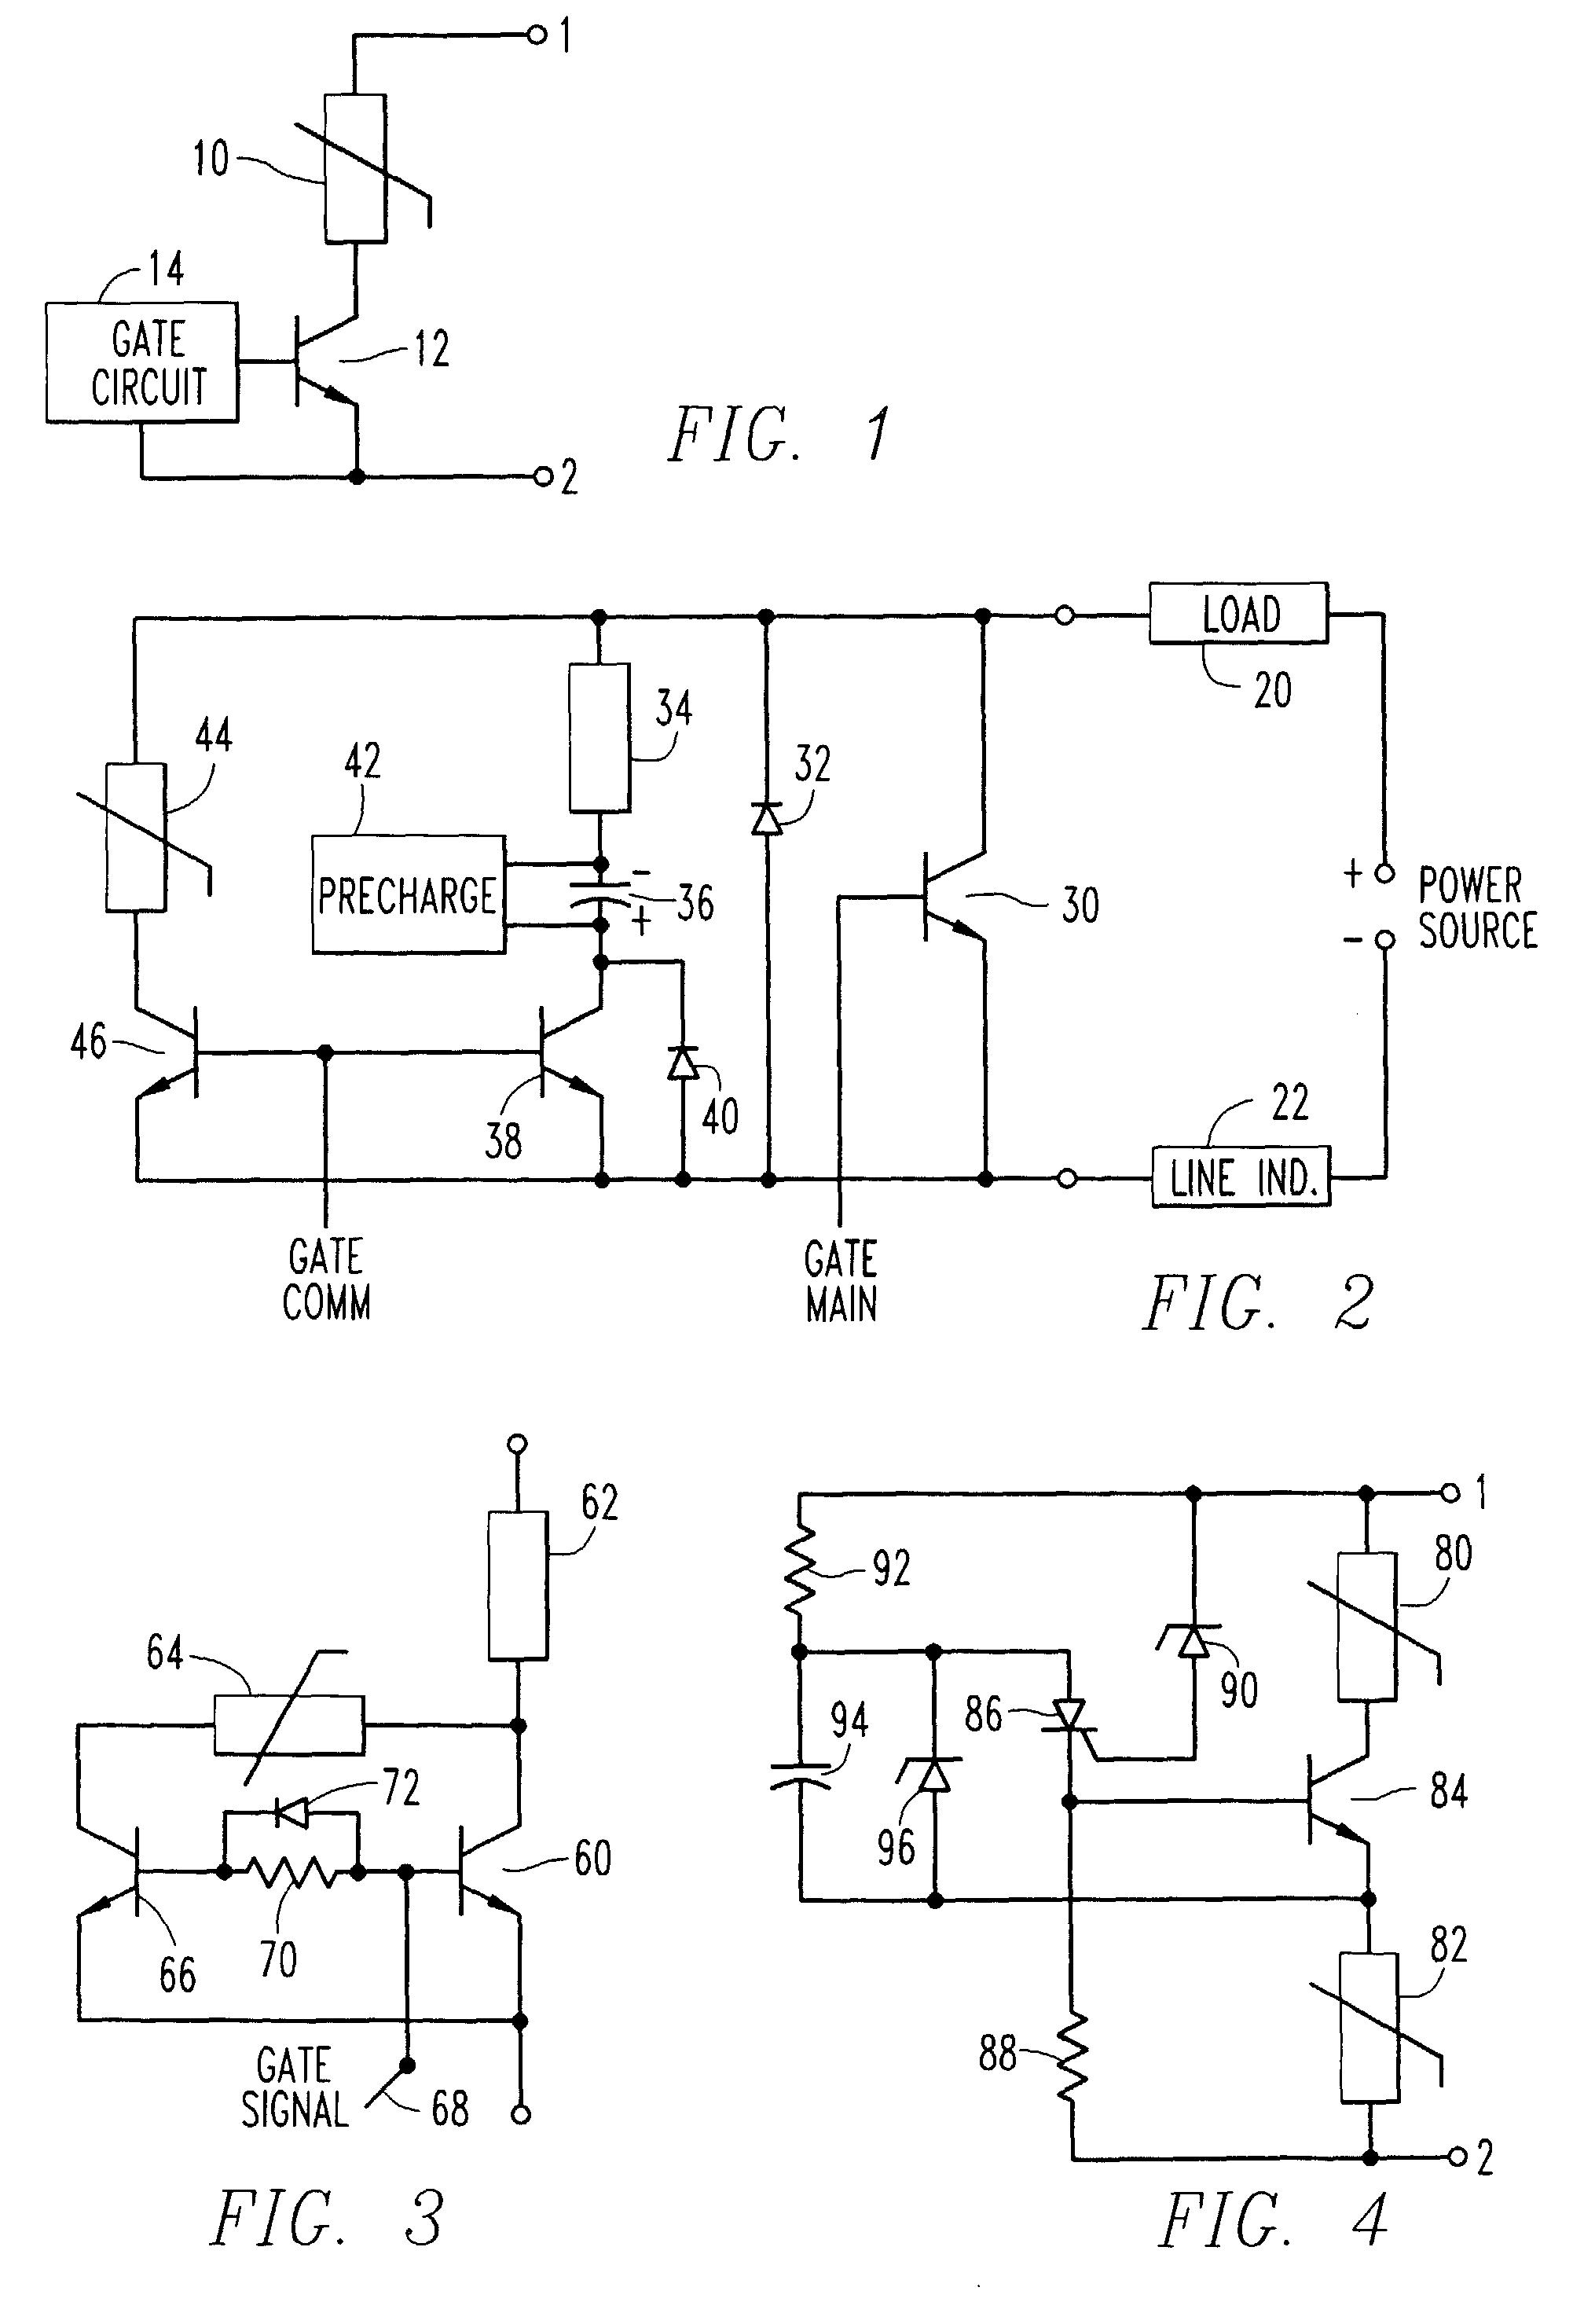 circuit breaker and voltage clamp circuit patent 0701313